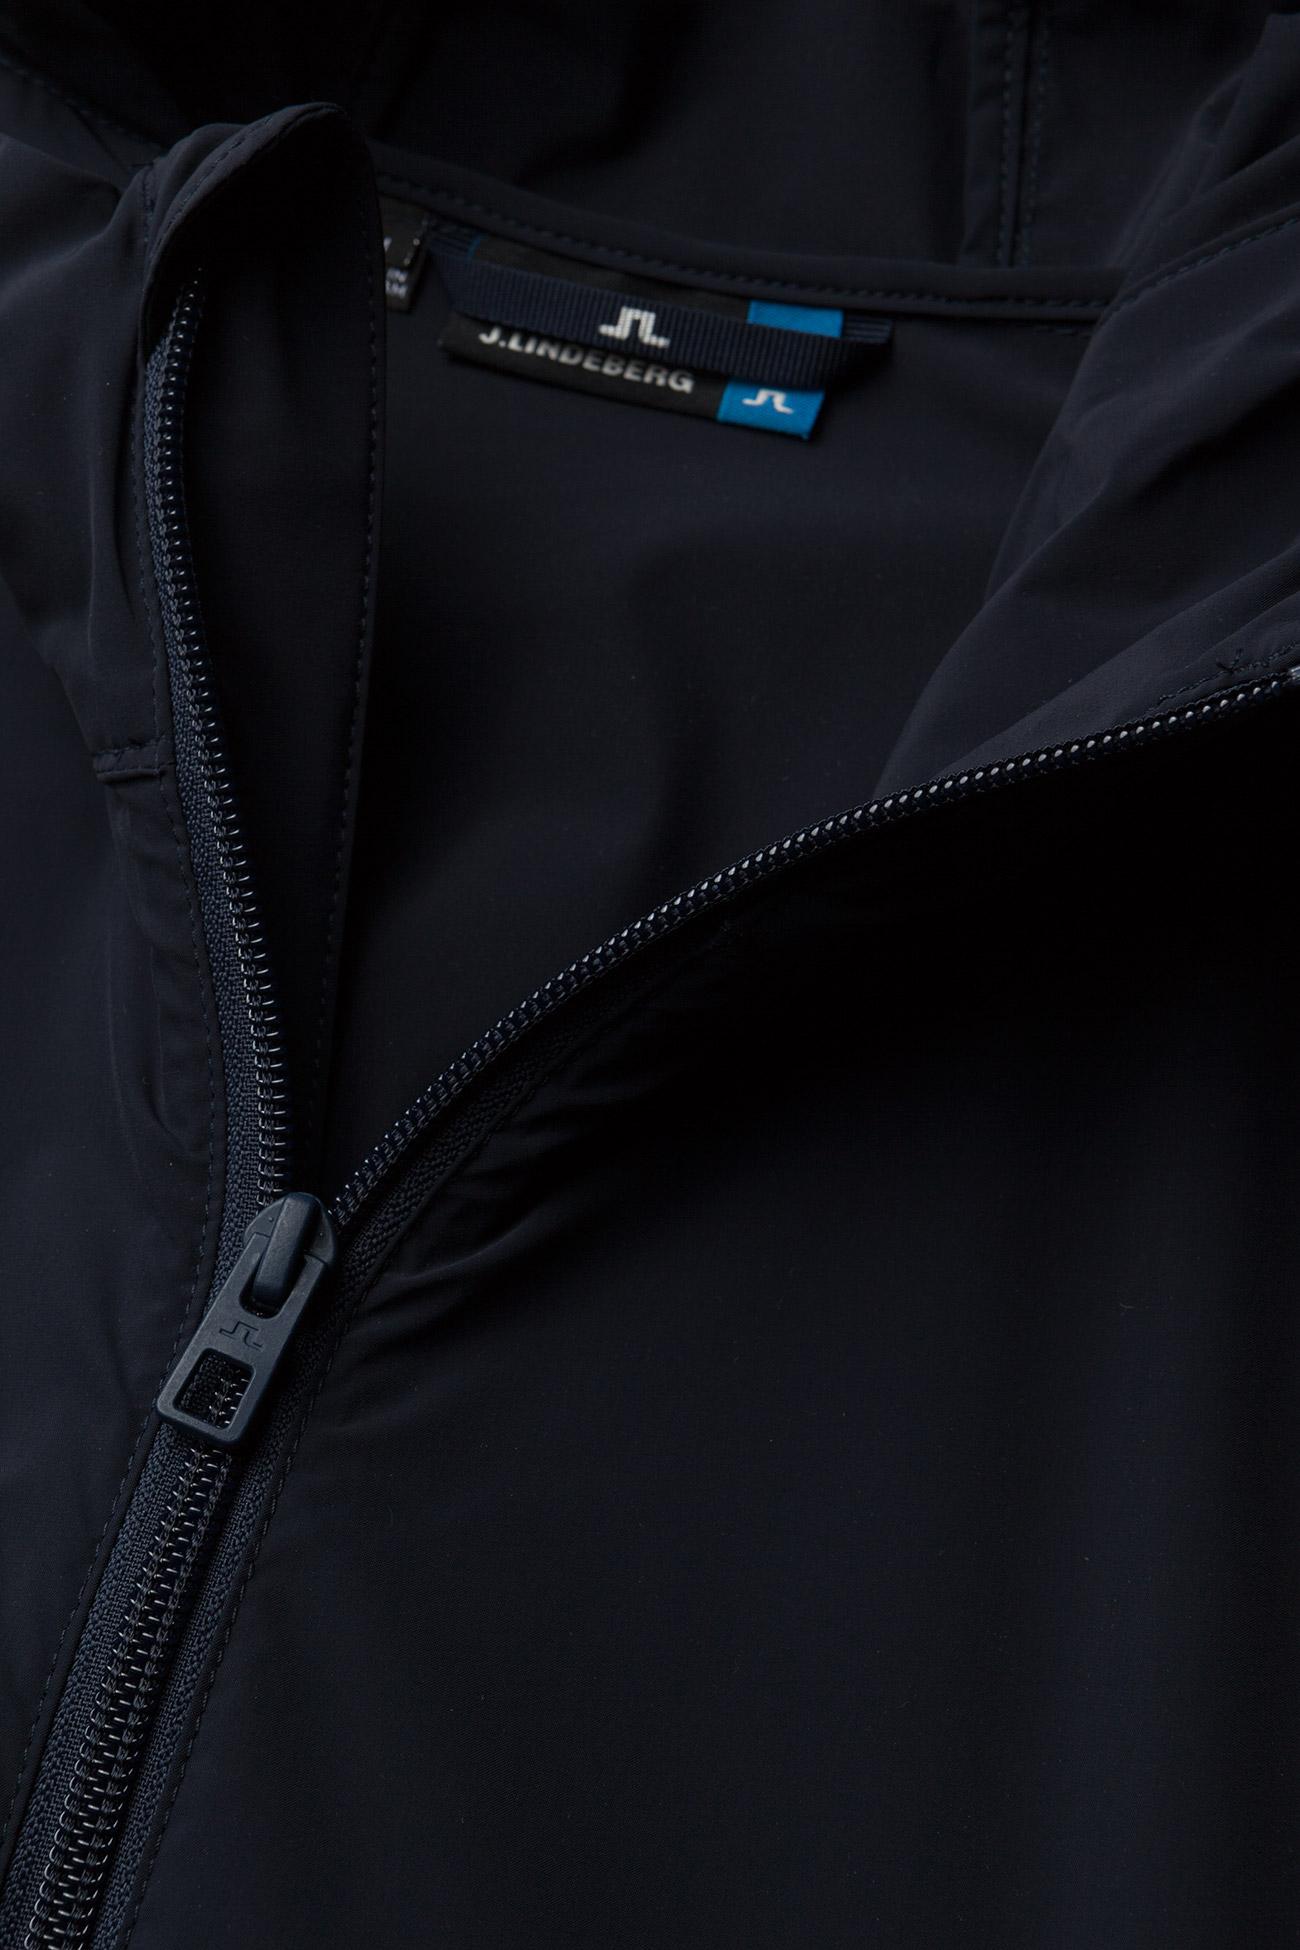 Jacket Tech Midjl NavyJLindeberg M Jeff PkOXZiu